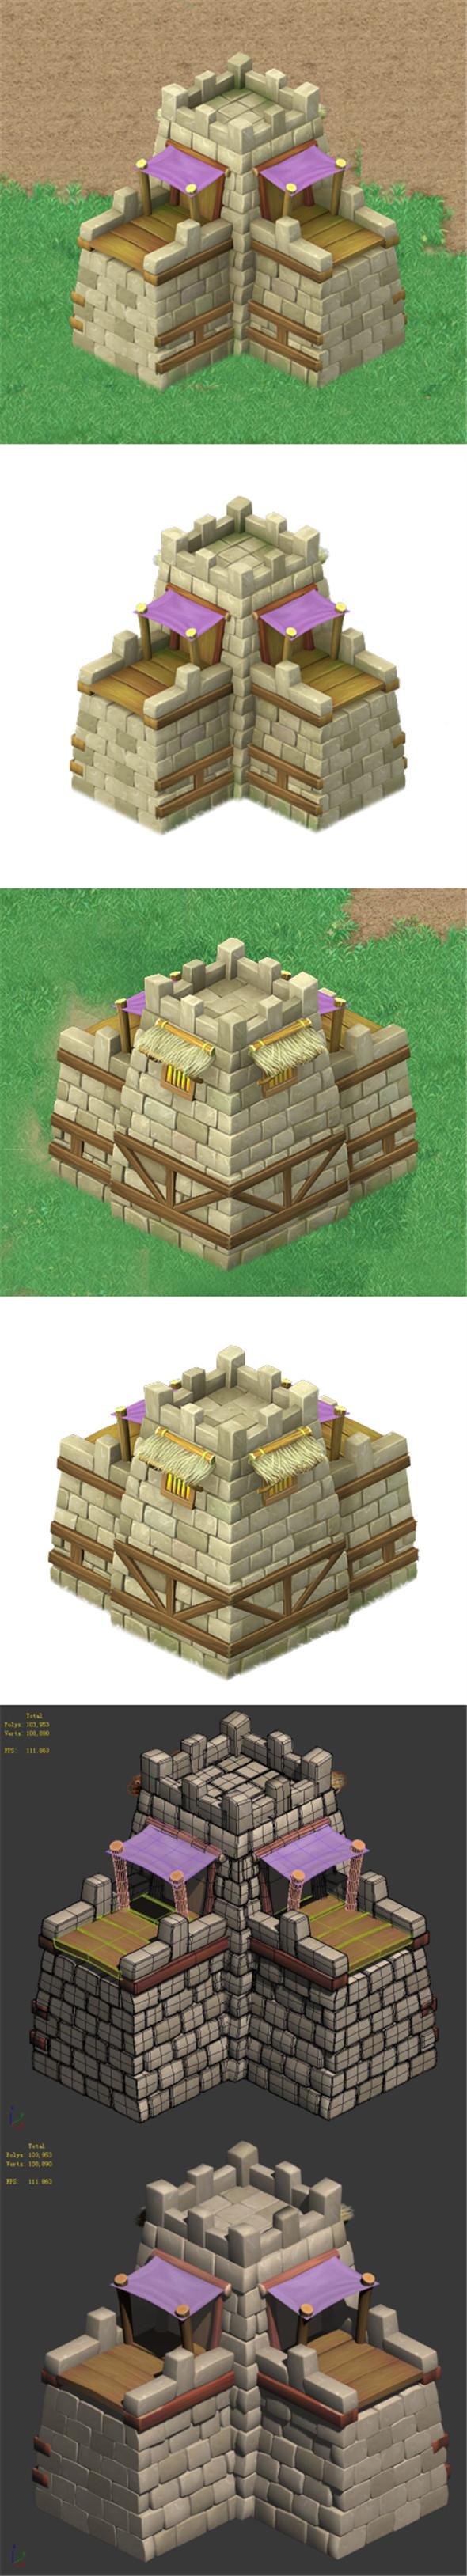 Cartoon World - City Gate 04 - 3DOcean Item for Sale